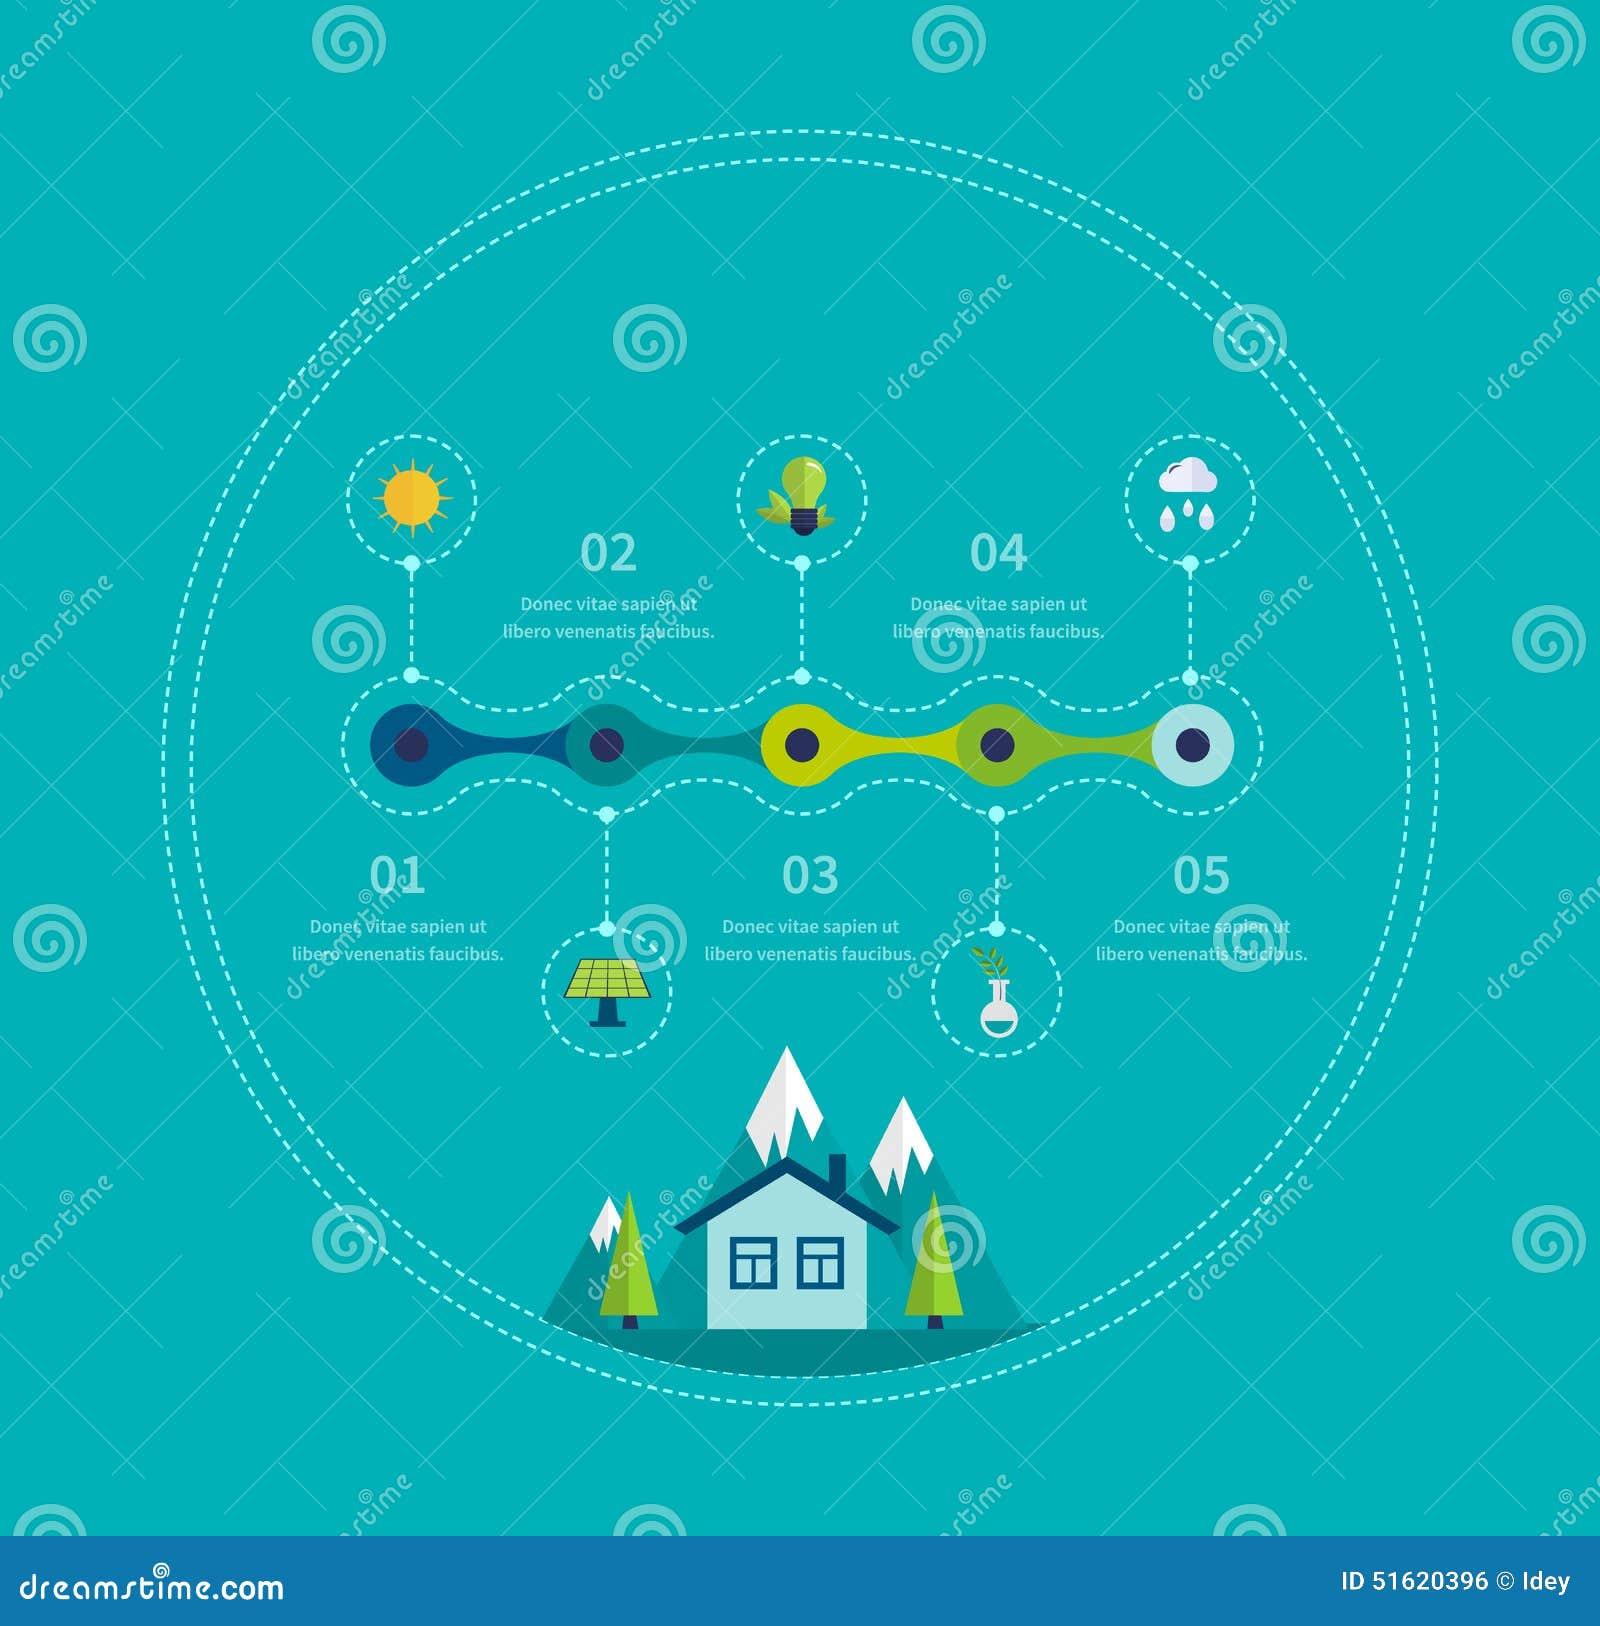 Environmental Concept Earthfriendly Landscapes: Village Landscape. Environmentally Friendly House Stock